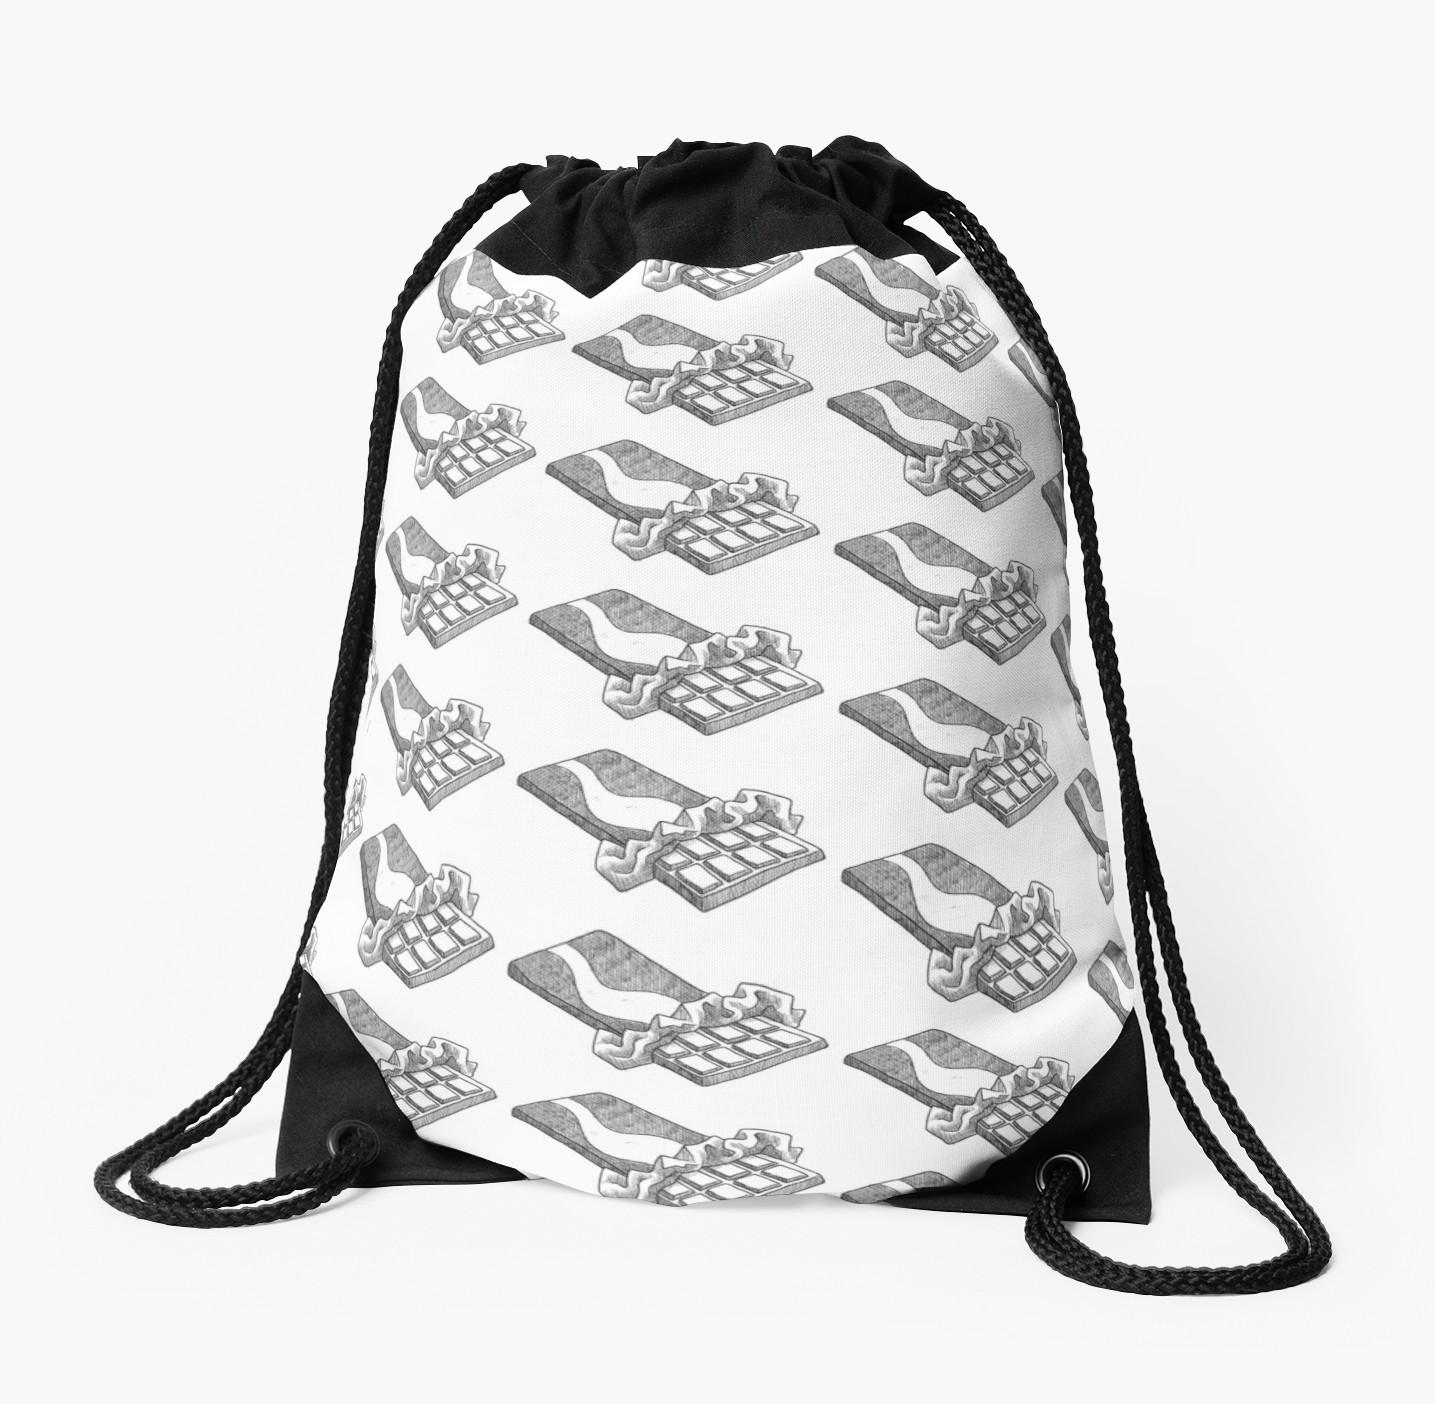 1435x1404 Chocolate Bar Drawing Drawstring Bag